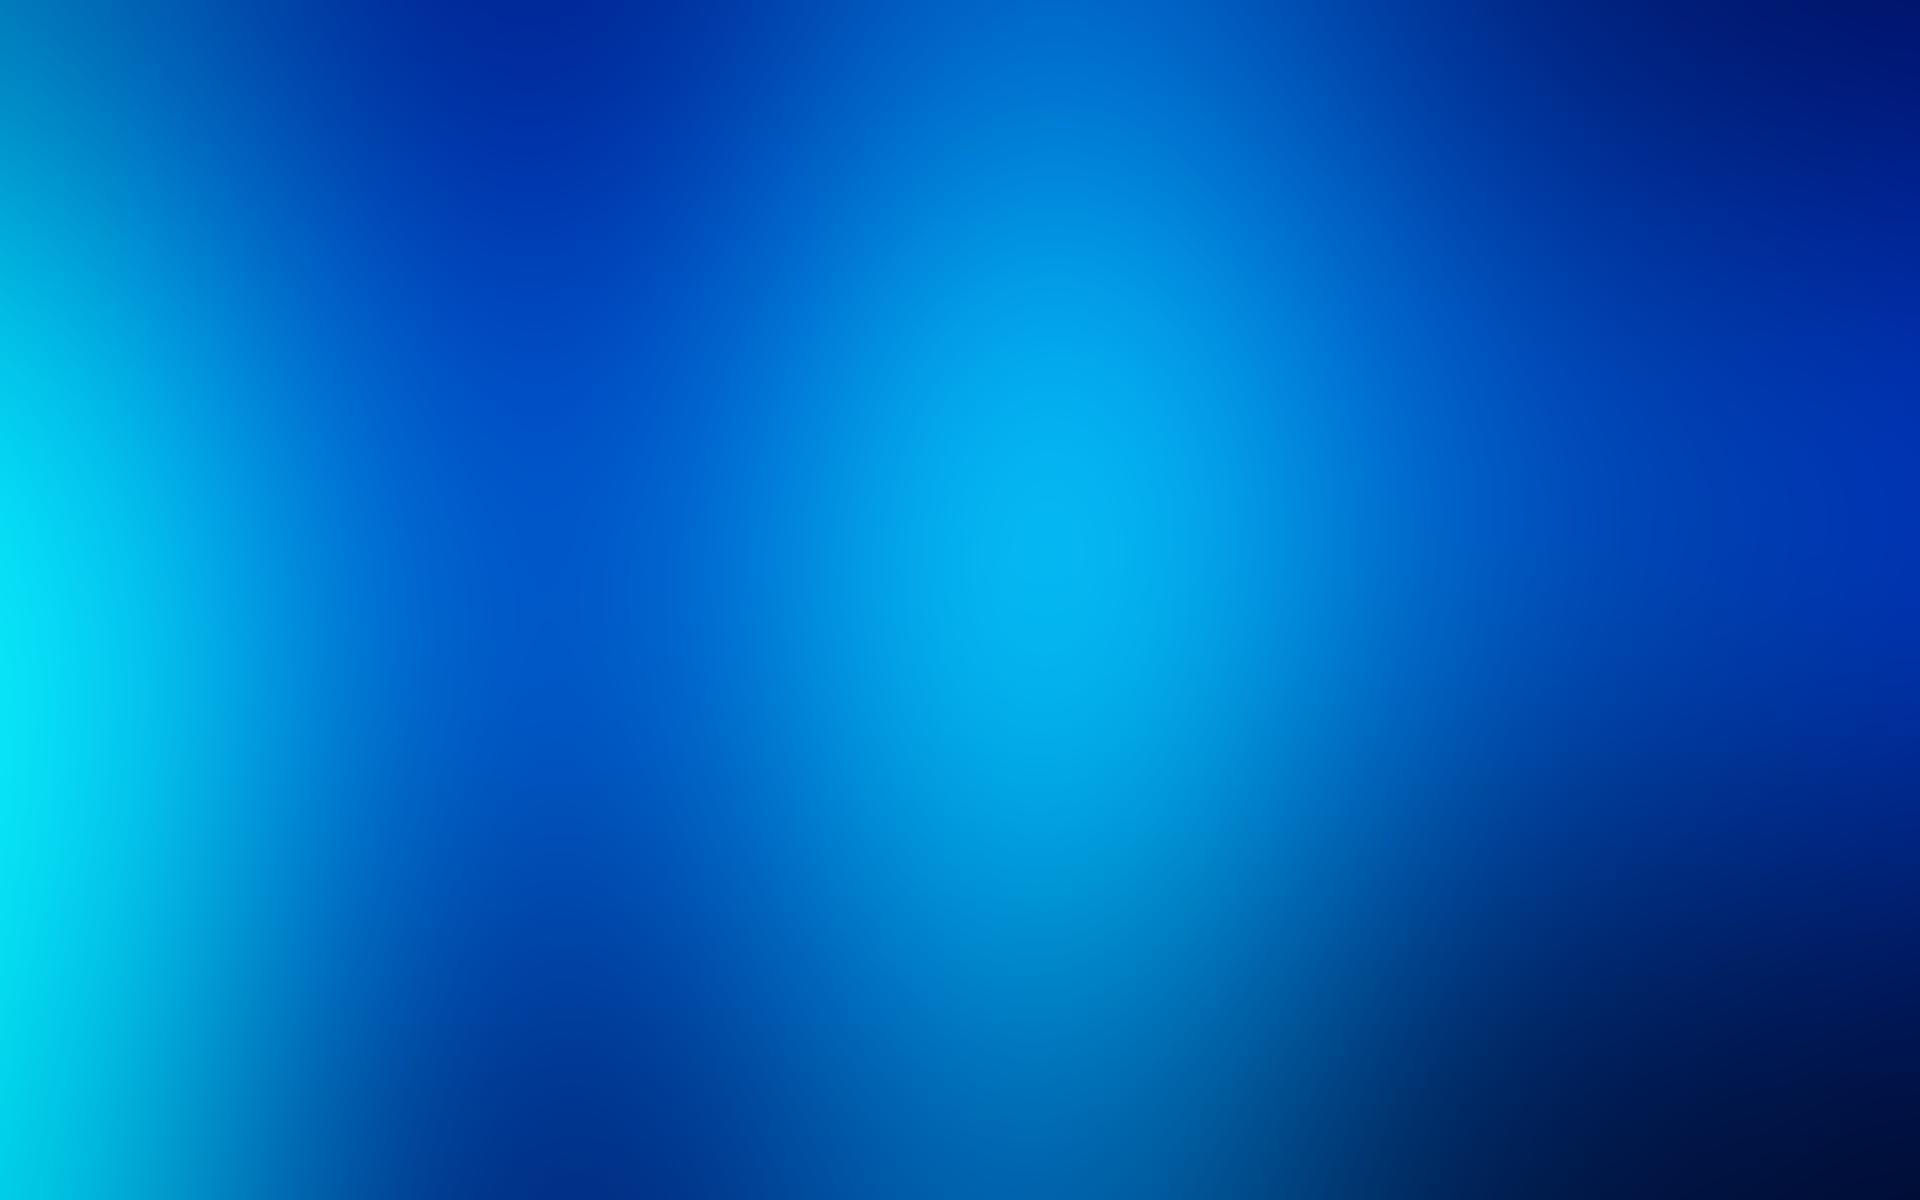 HD-Blue-Wallpapers-For-Desktop